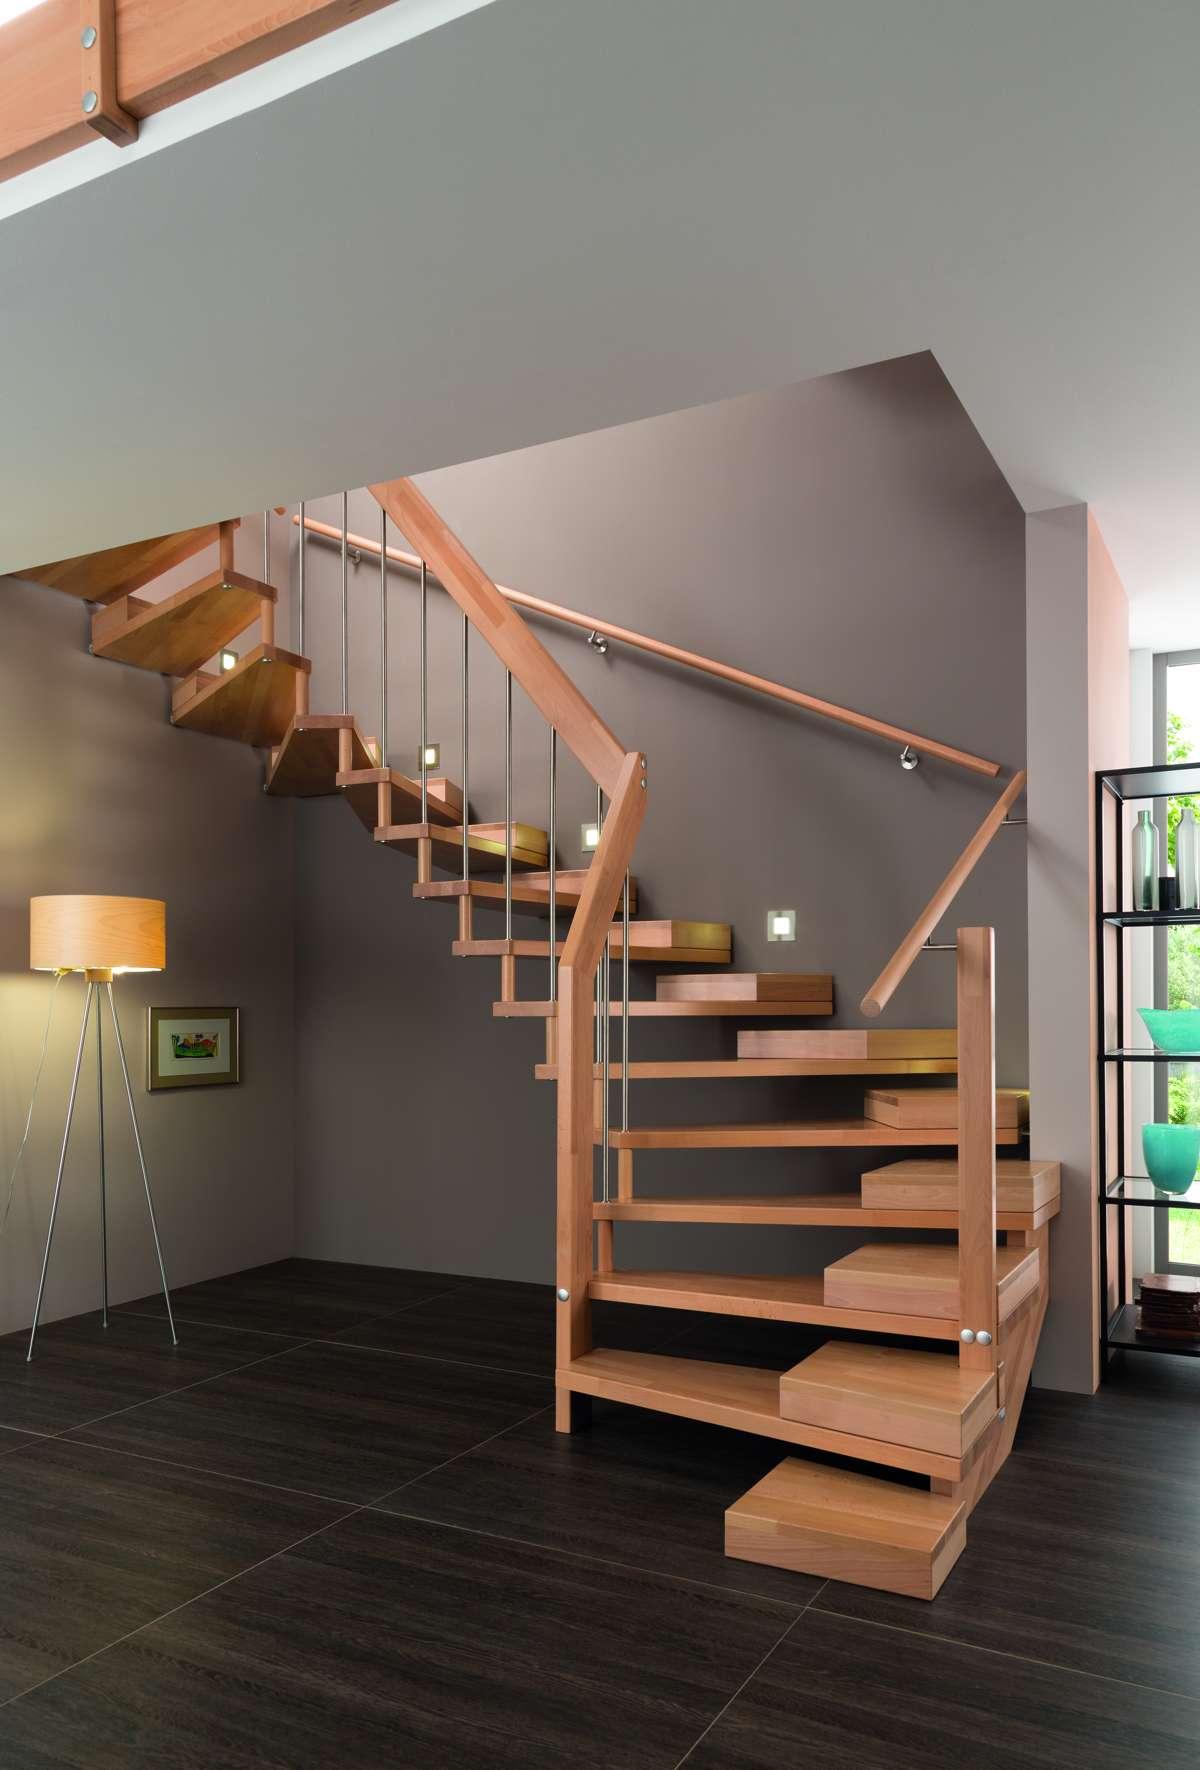 arcus treppen arcus treppen kindersichere treppen direkt. Black Bedroom Furniture Sets. Home Design Ideas